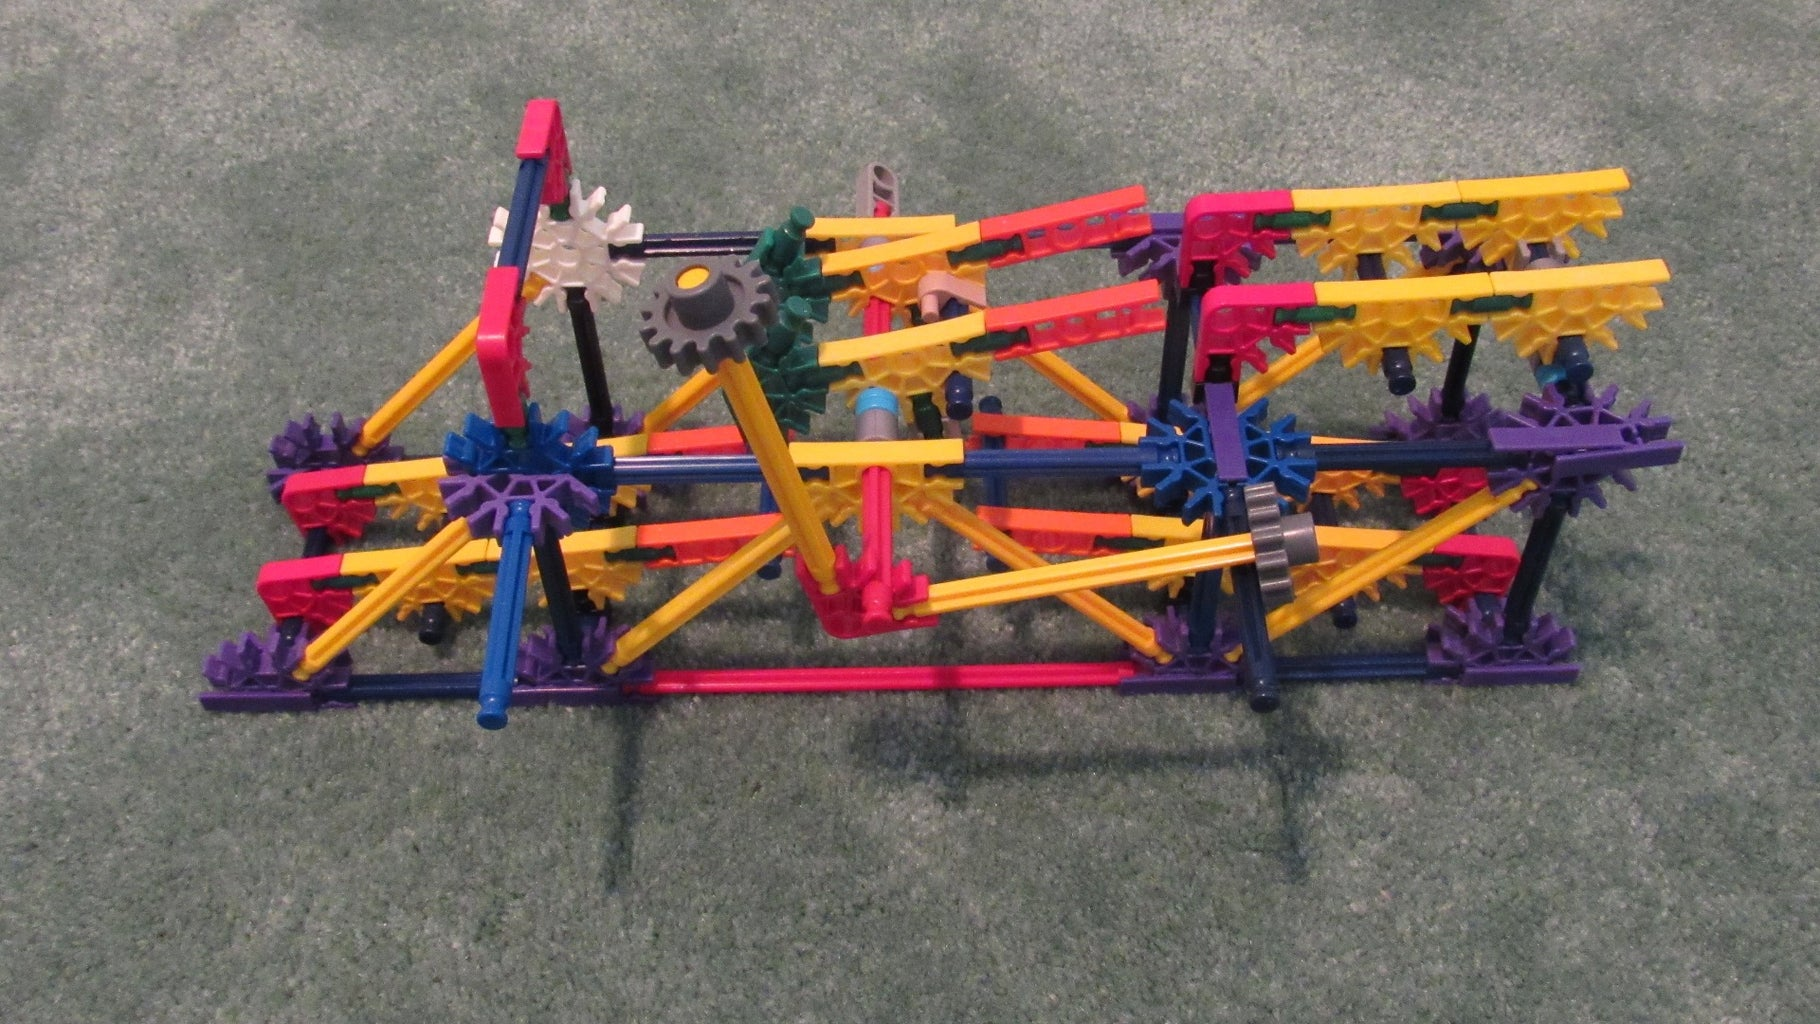 Compact Separator: a K'nex Ball Machine Separator